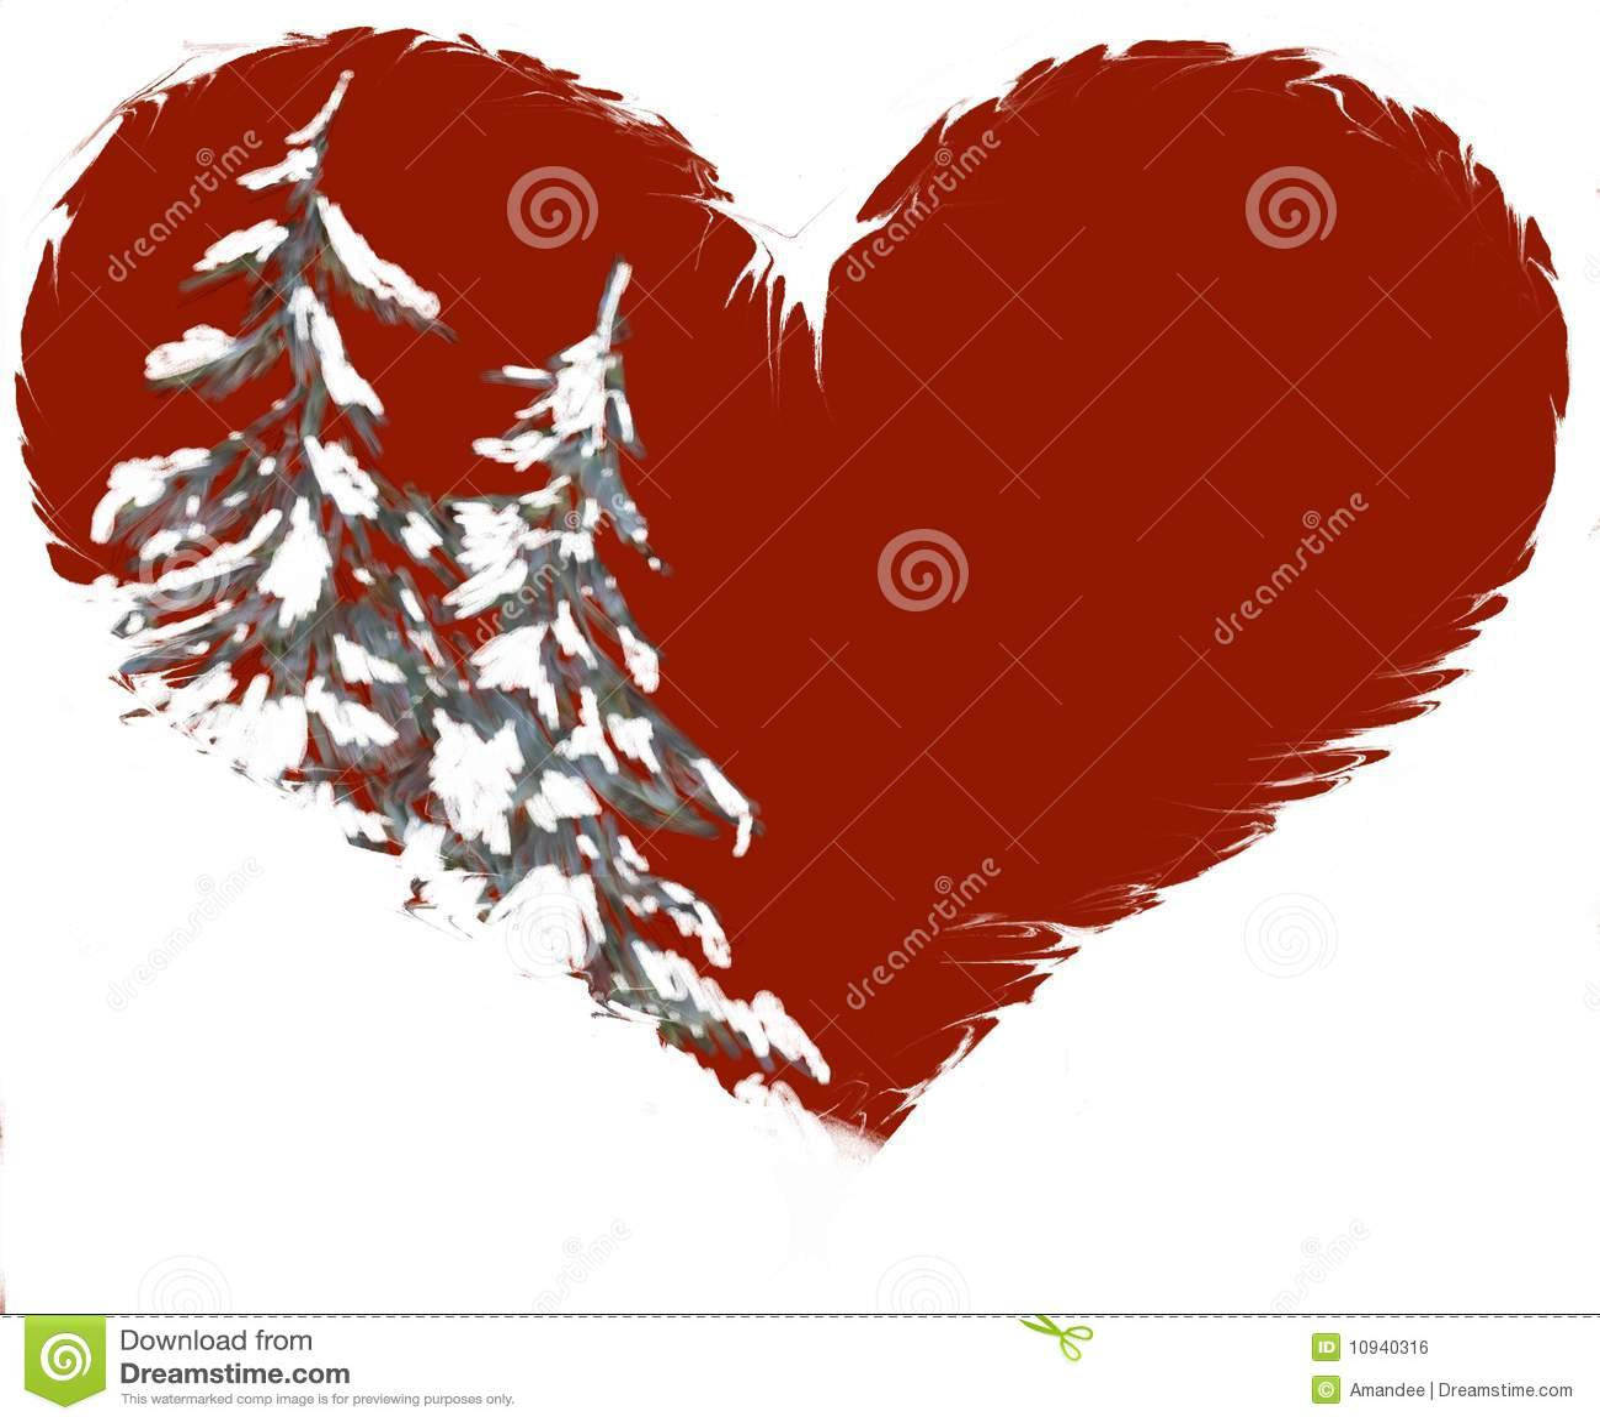 snowy pine trees in heart shape illustration stock